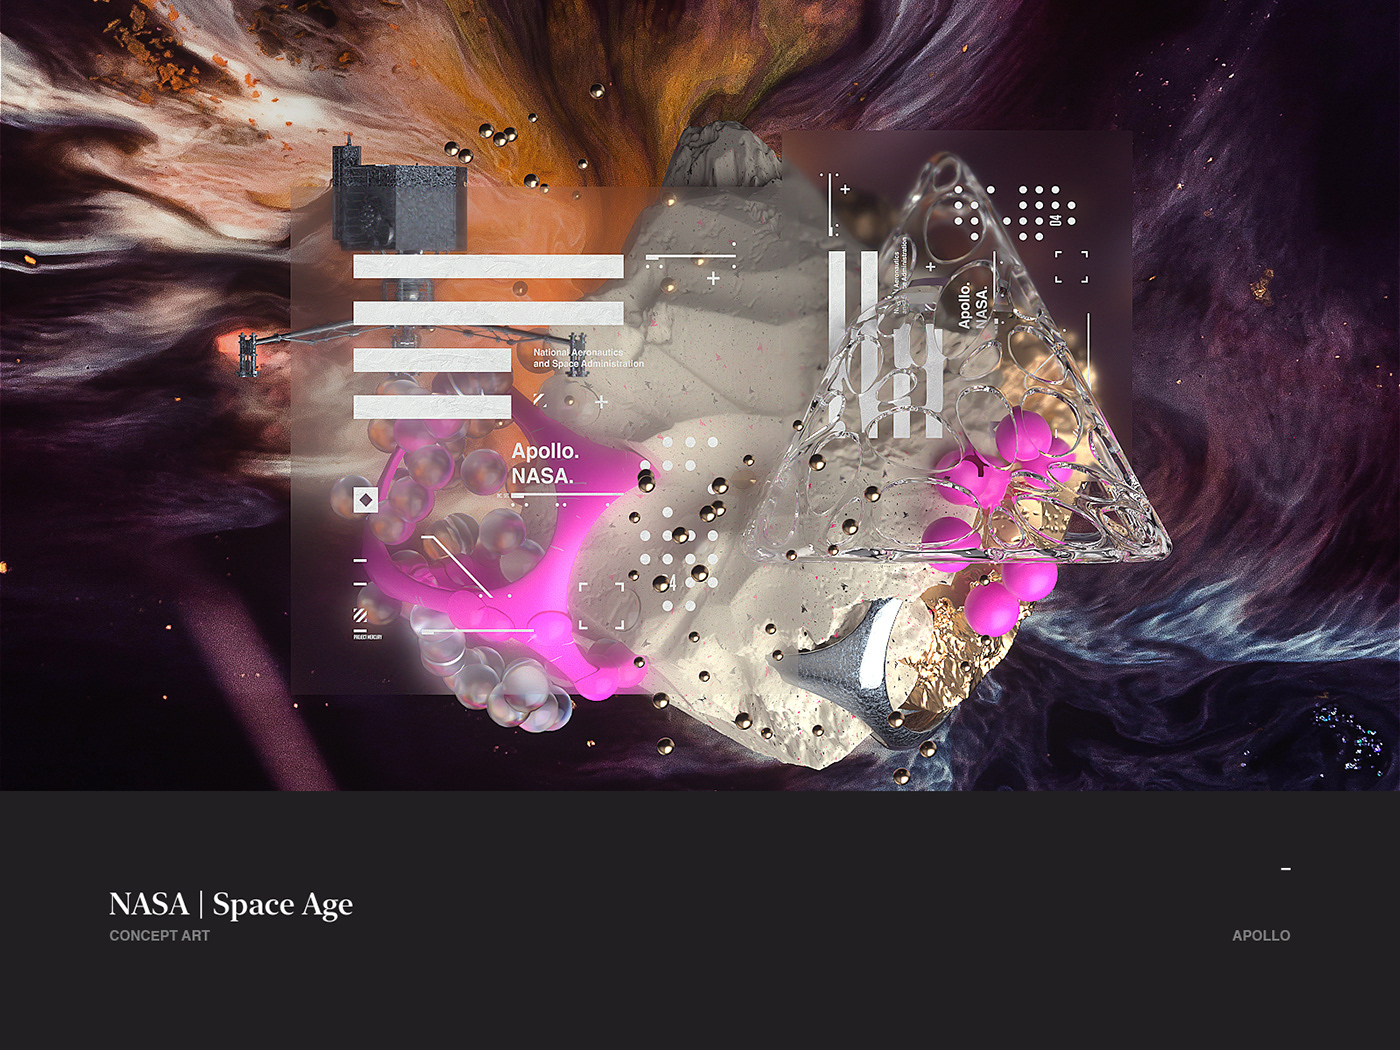 space age techn visit - HD1400×1050